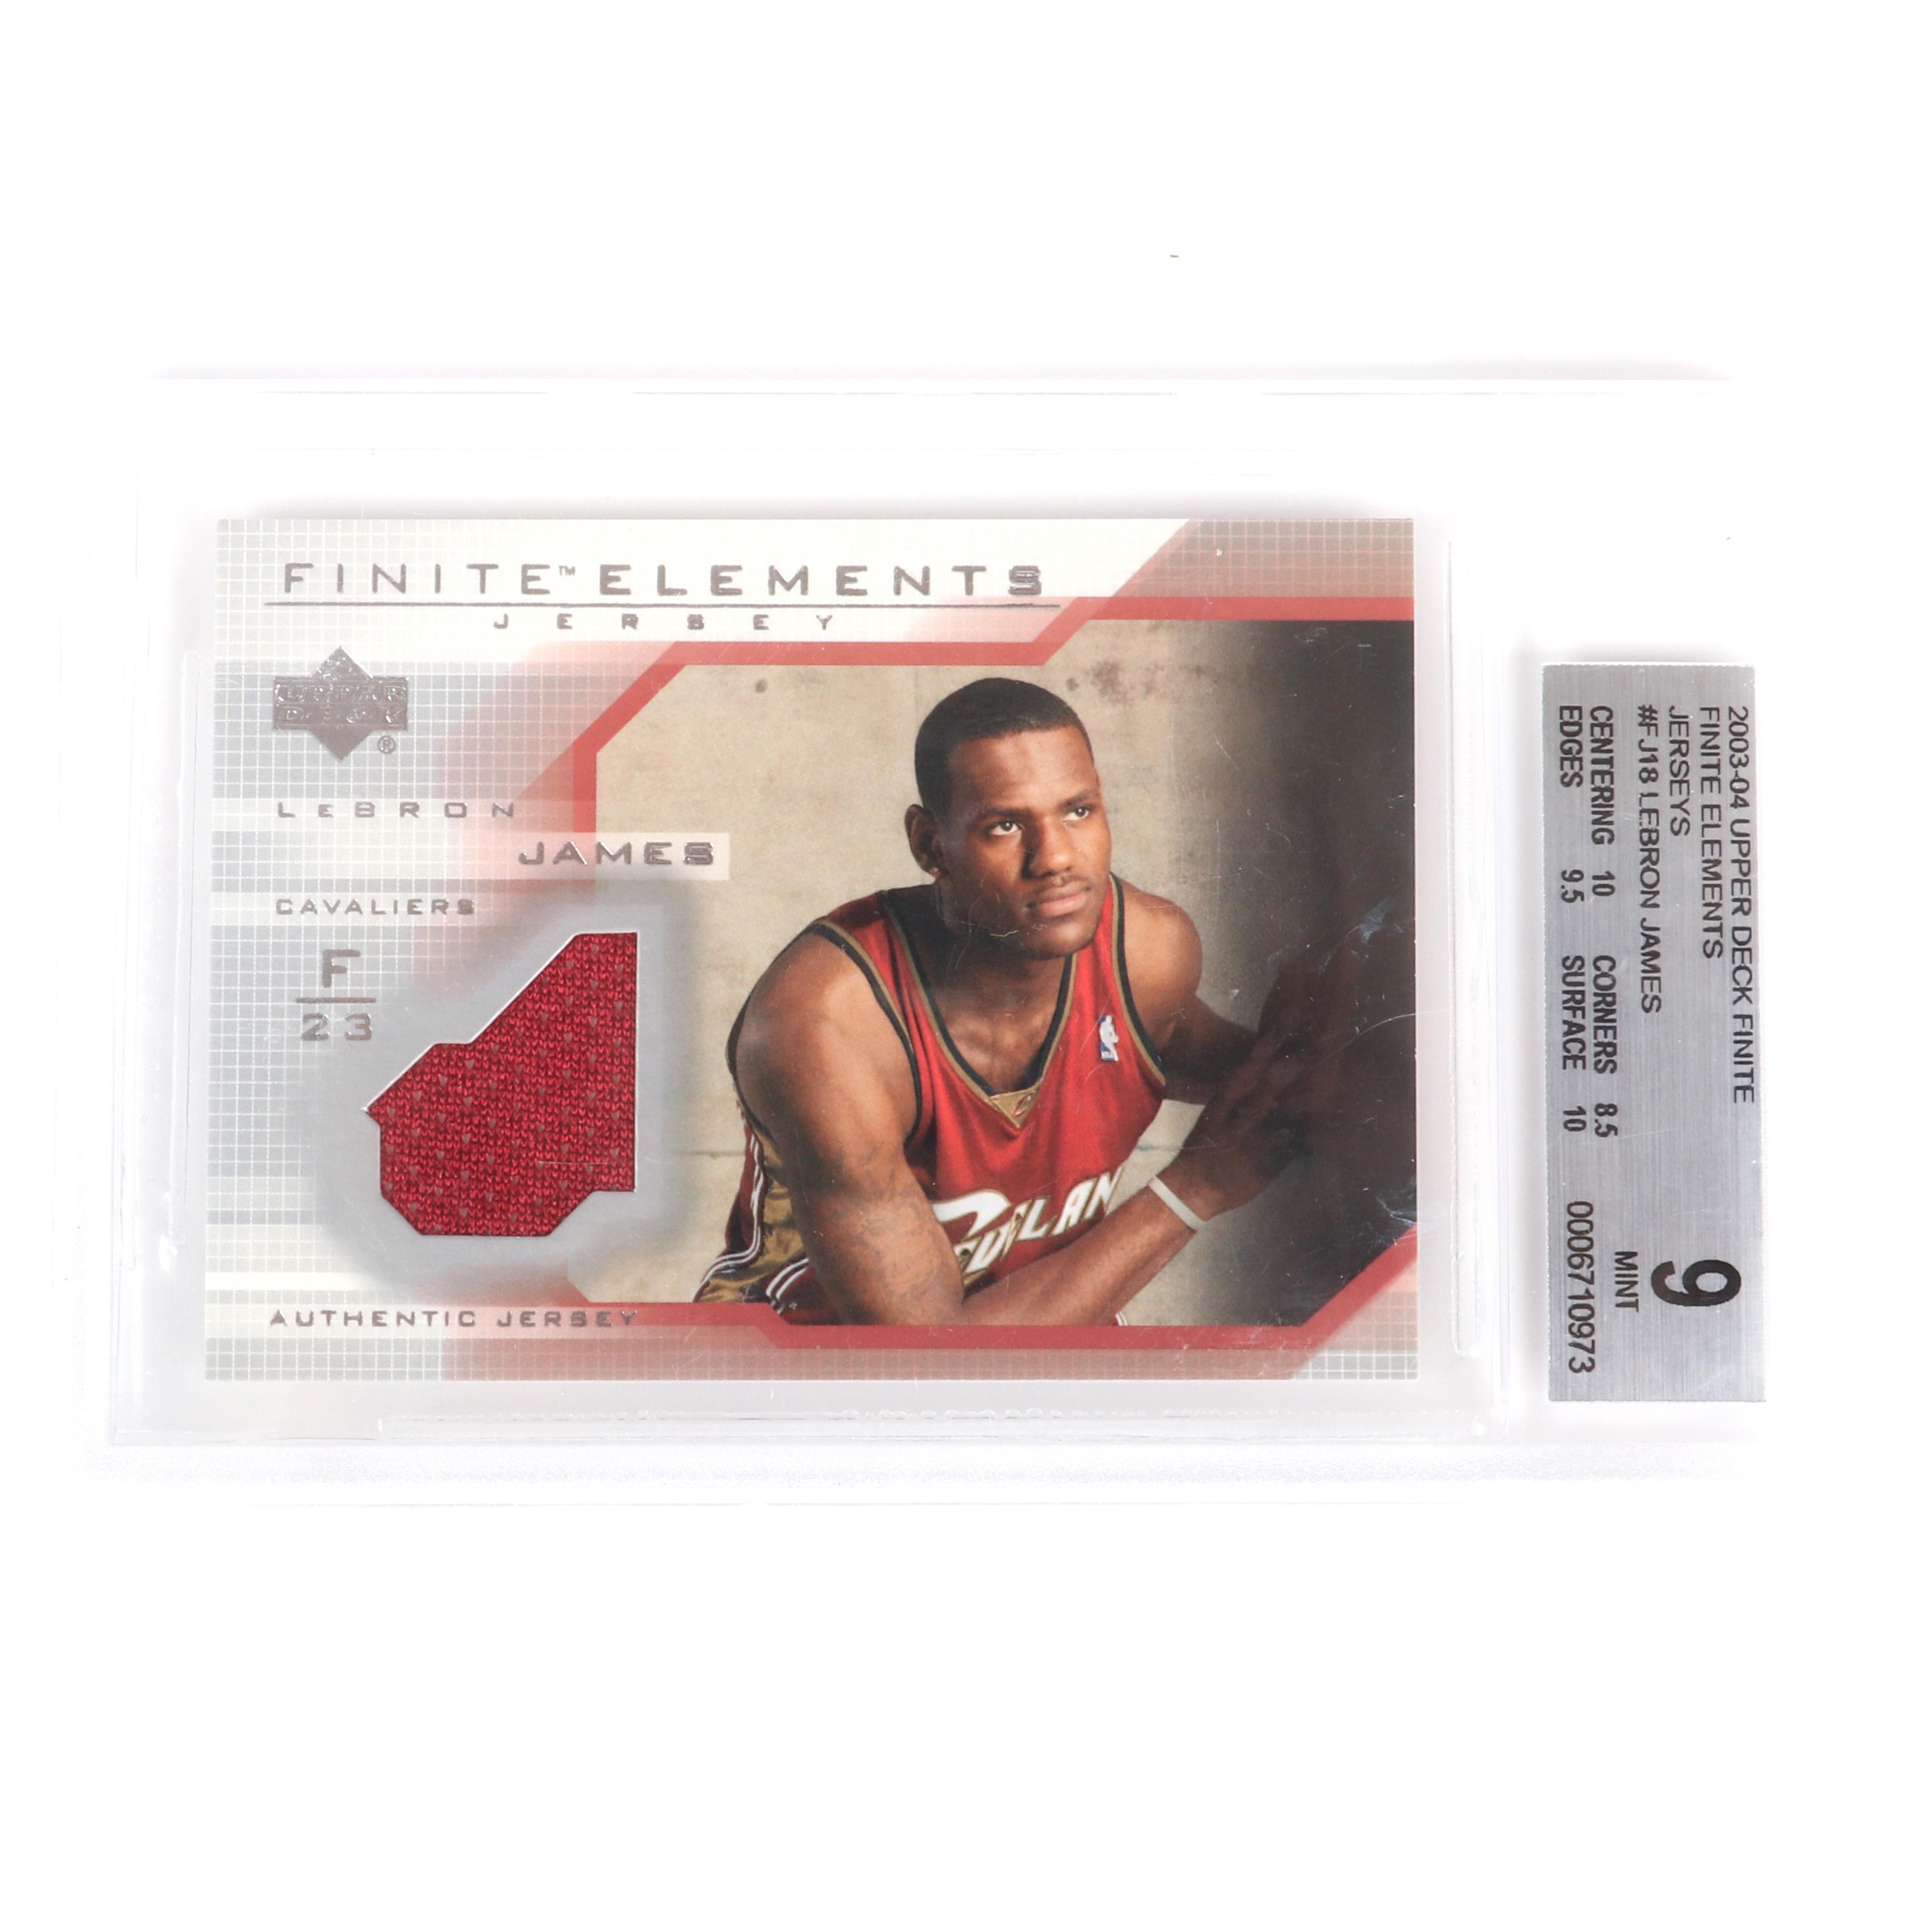 2003-04 Lebron James Rookie Finite Elements Card #FJ18 BGS 9